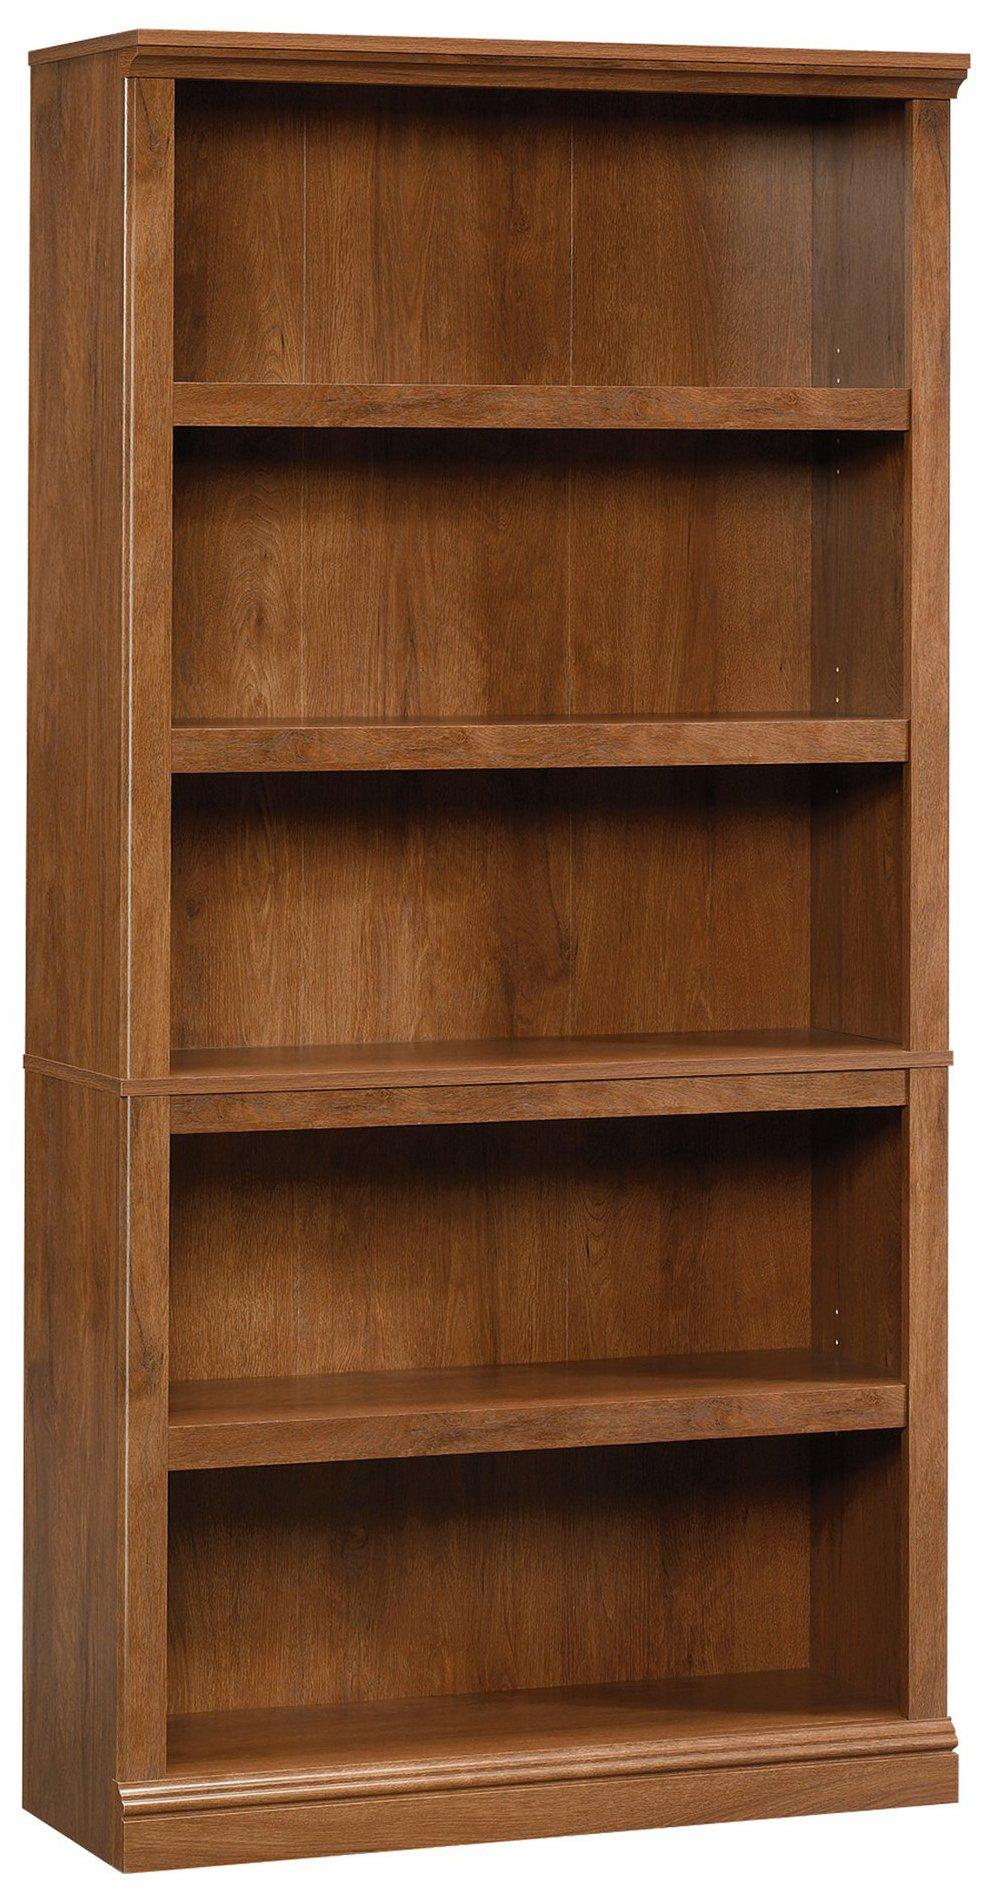 Sauder 410367 5-Shelf Split Bookcase, L: 35.28'' x W: 13.23'' x H: 69.76'', Oiled Oak finish